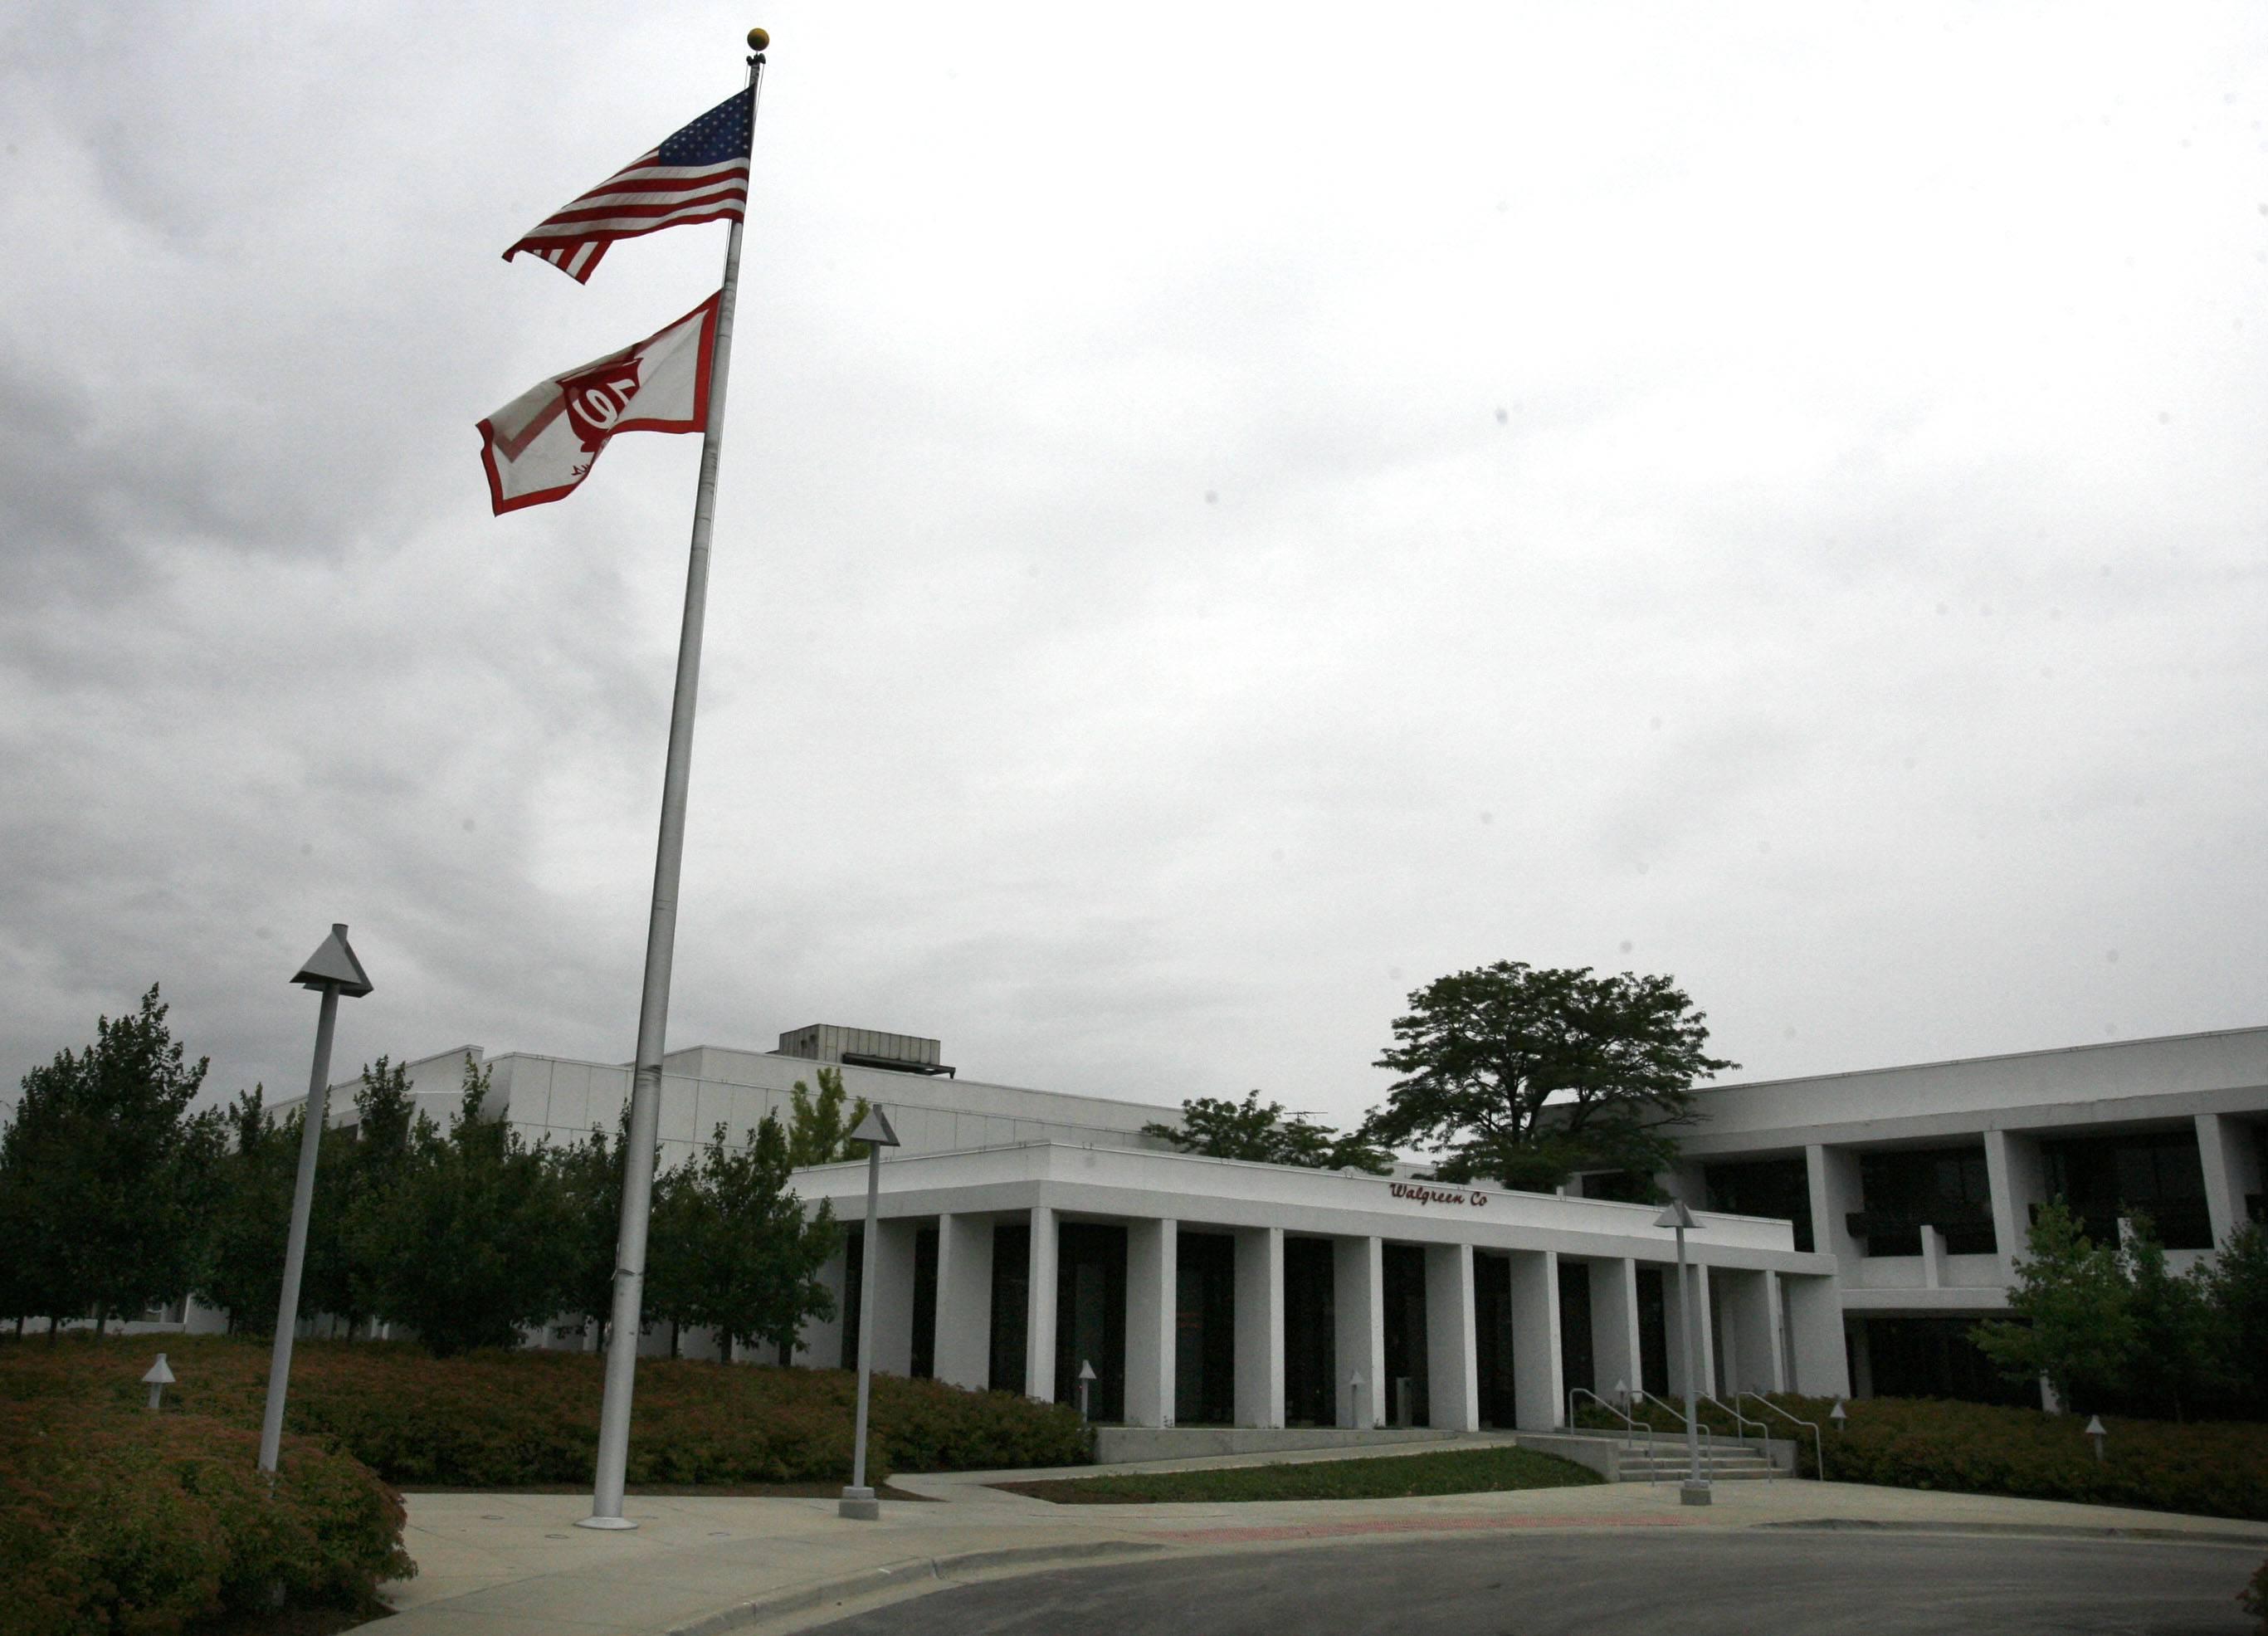 Walgreens cuts 370 jobs